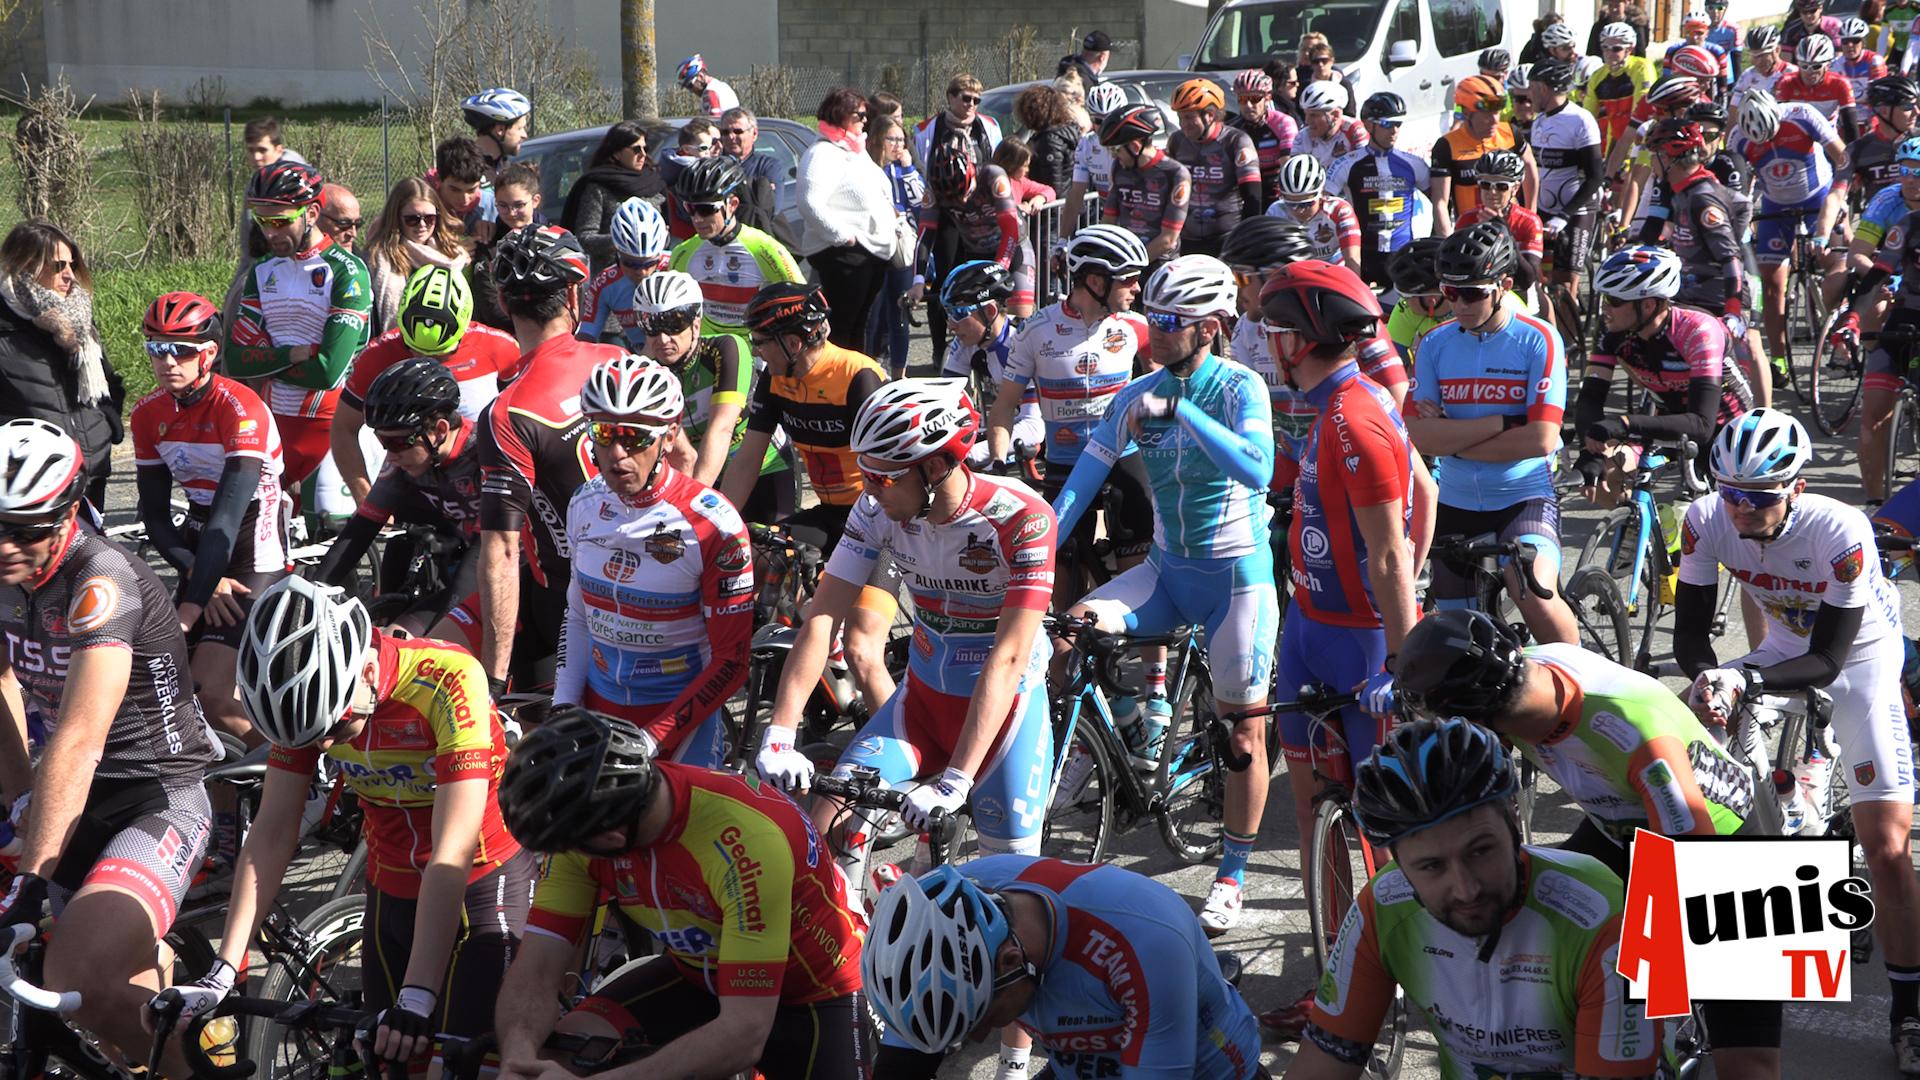 Grand prix Carrefour Market Cyclisme coureurs